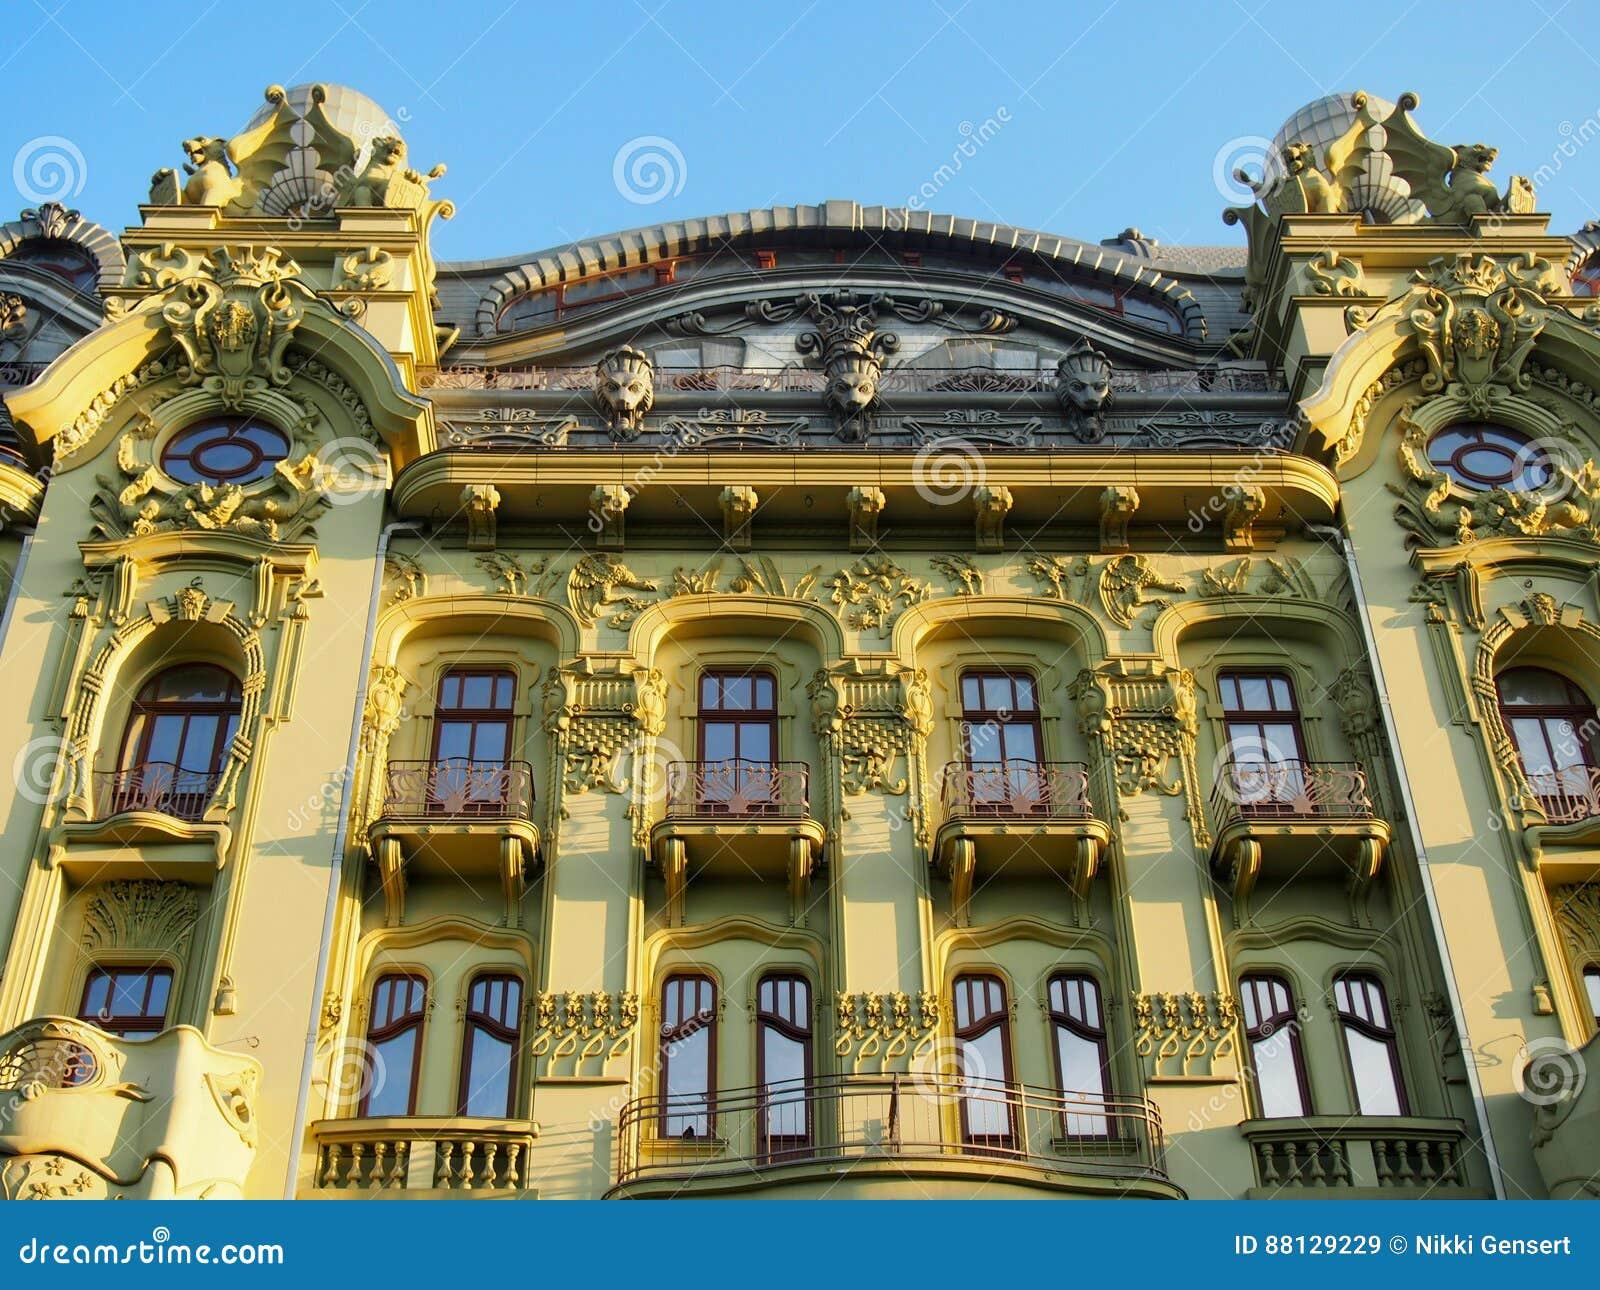 Ornate Facade On Building In Odessa Ukraine Stock Image ...